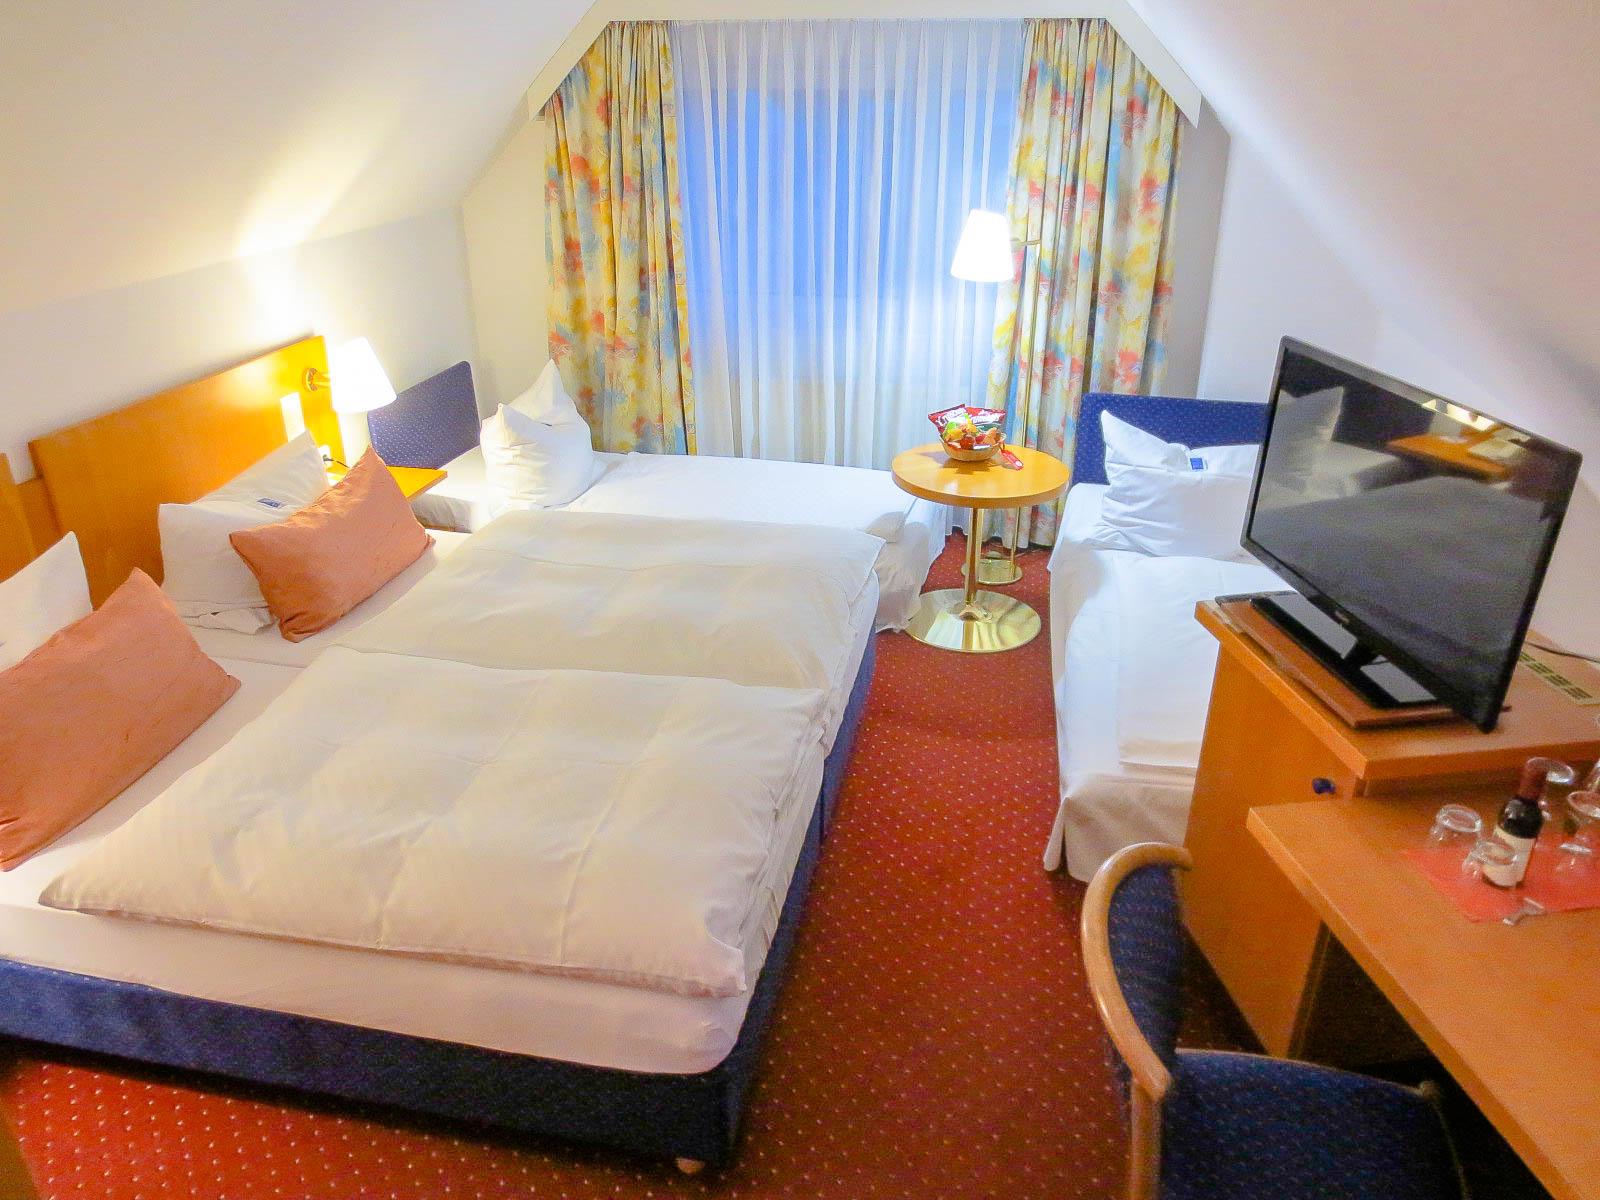 AKZENT Hotel Möhringer Hof - Vierbettzimmer